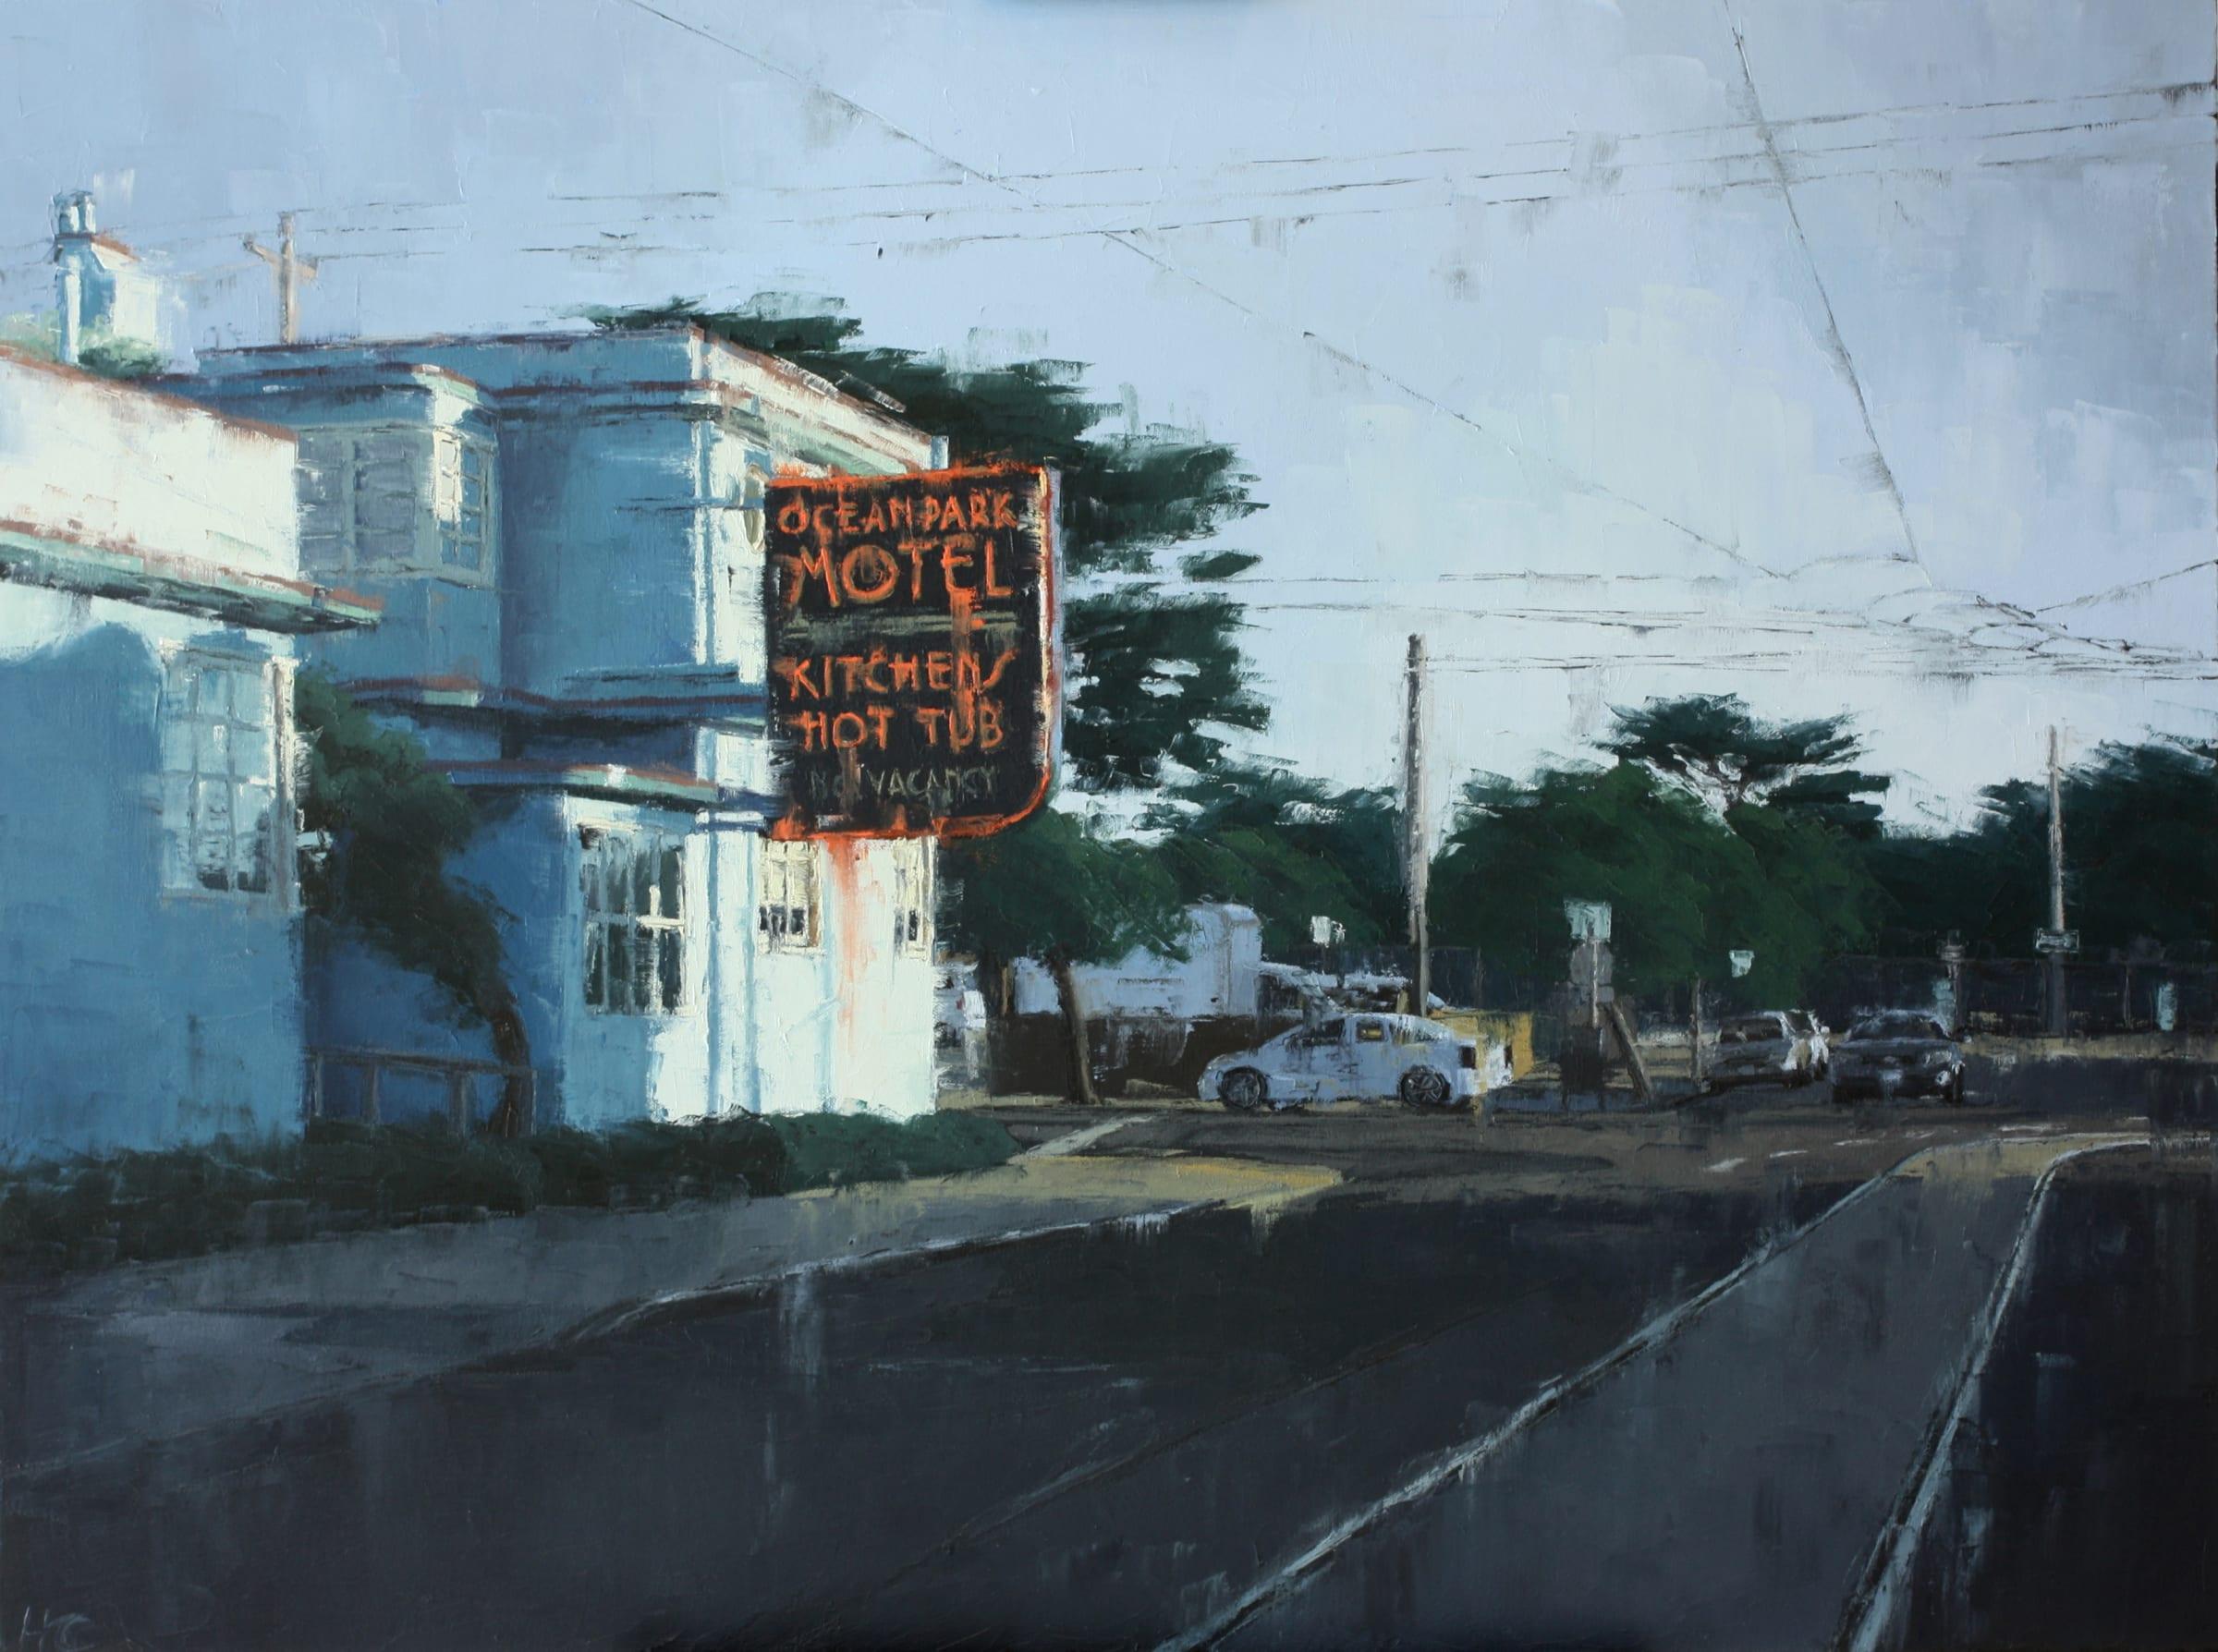 "<span class=""link fancybox-details-link""><a href=""/artists/34-heather-capen/works/164-heather-capen-ocean-park-motel/"">View Detail Page</a></span><div class=""artist""><strong>Heather Capen</strong></div> <div class=""title""><em>Ocean Park Motel</em></div> <div class=""medium"">Oil on Canvas</div> <div class=""dimensions"">31.5 x 41.5 inches</div>"